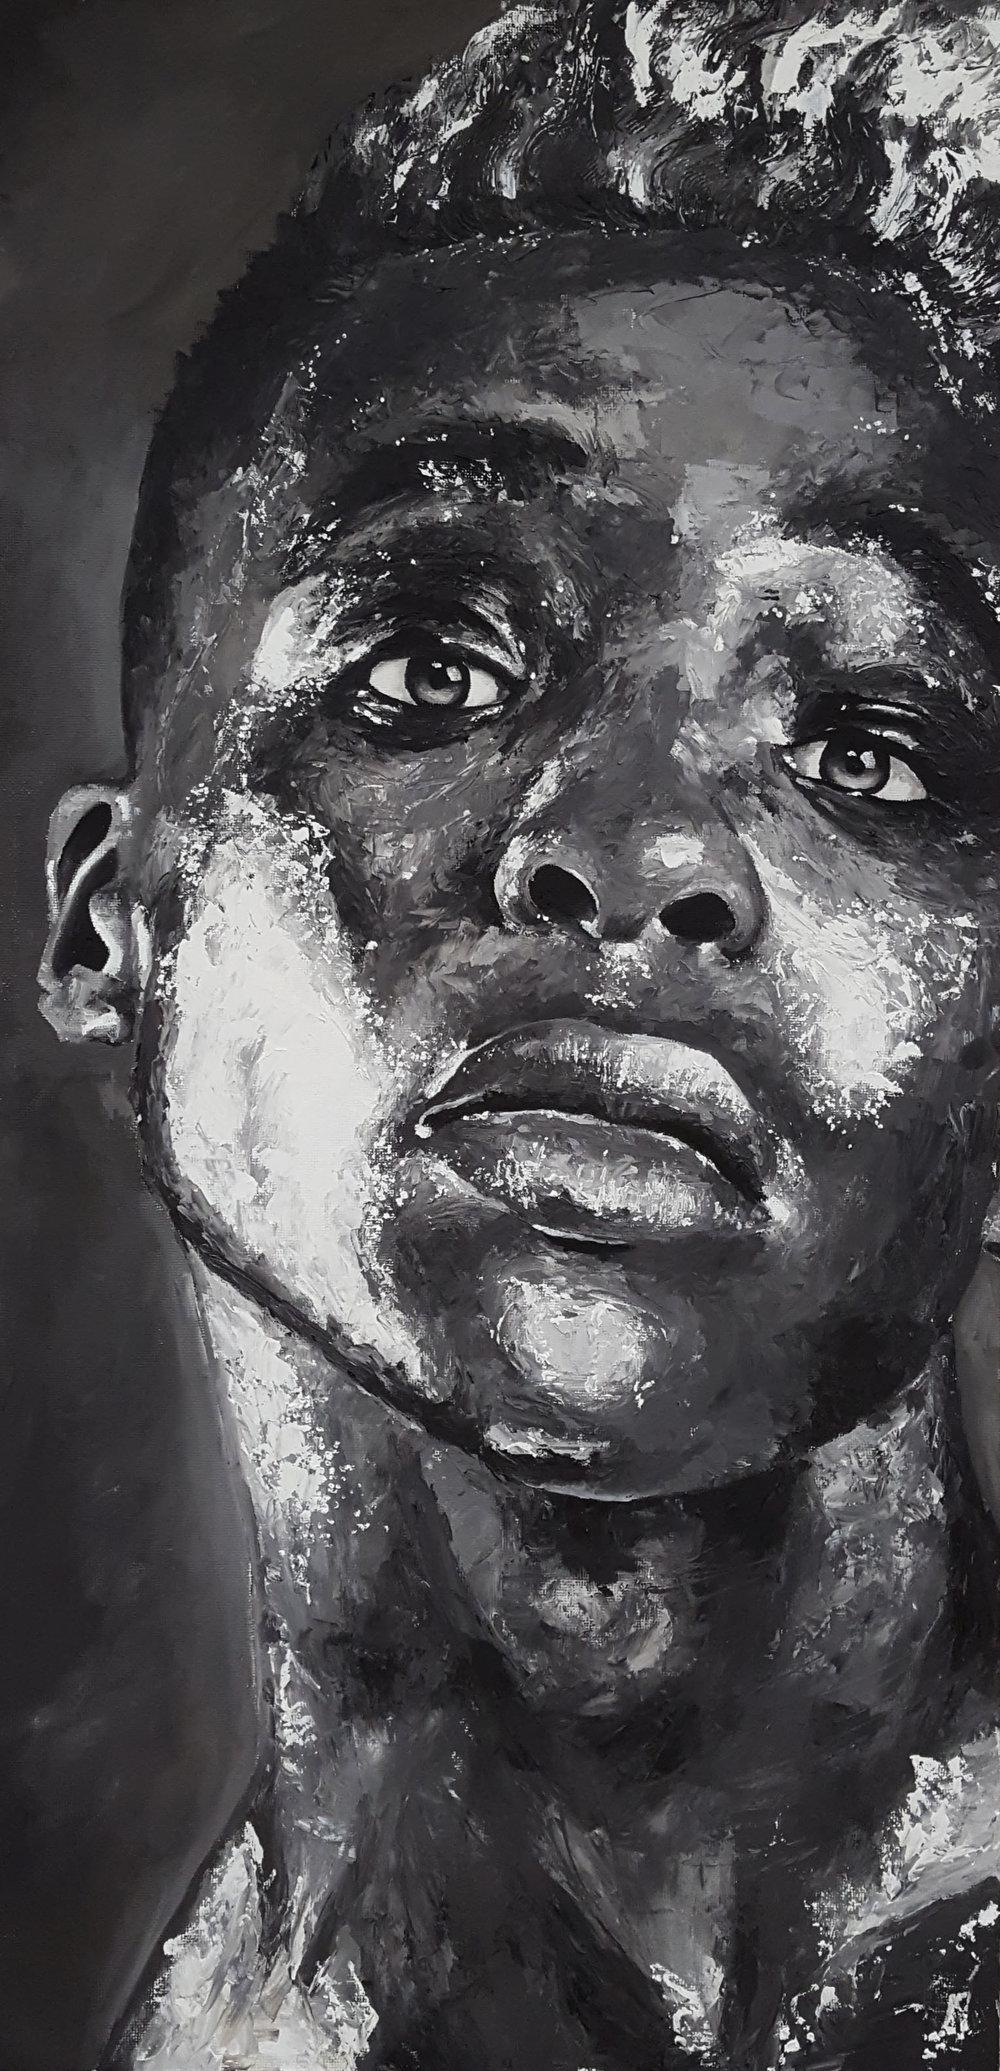 TravionPayne_Self-portrait_48x24.jpg